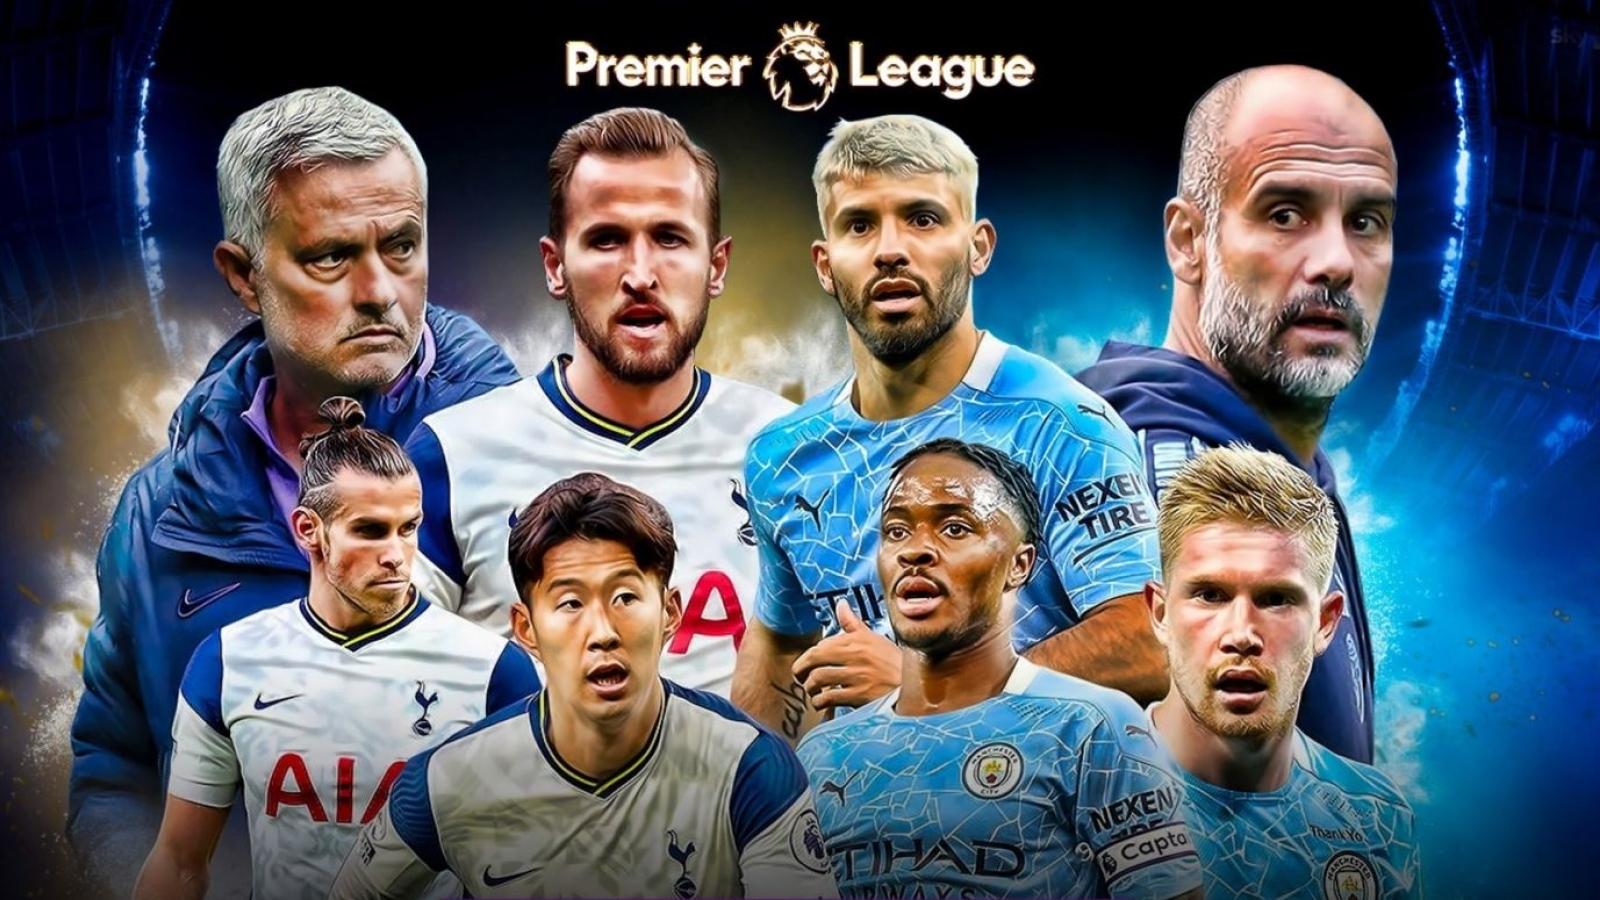 Tottenham - Man City: Jose Mourinho ở cửa trên so với Pep Guardiola?